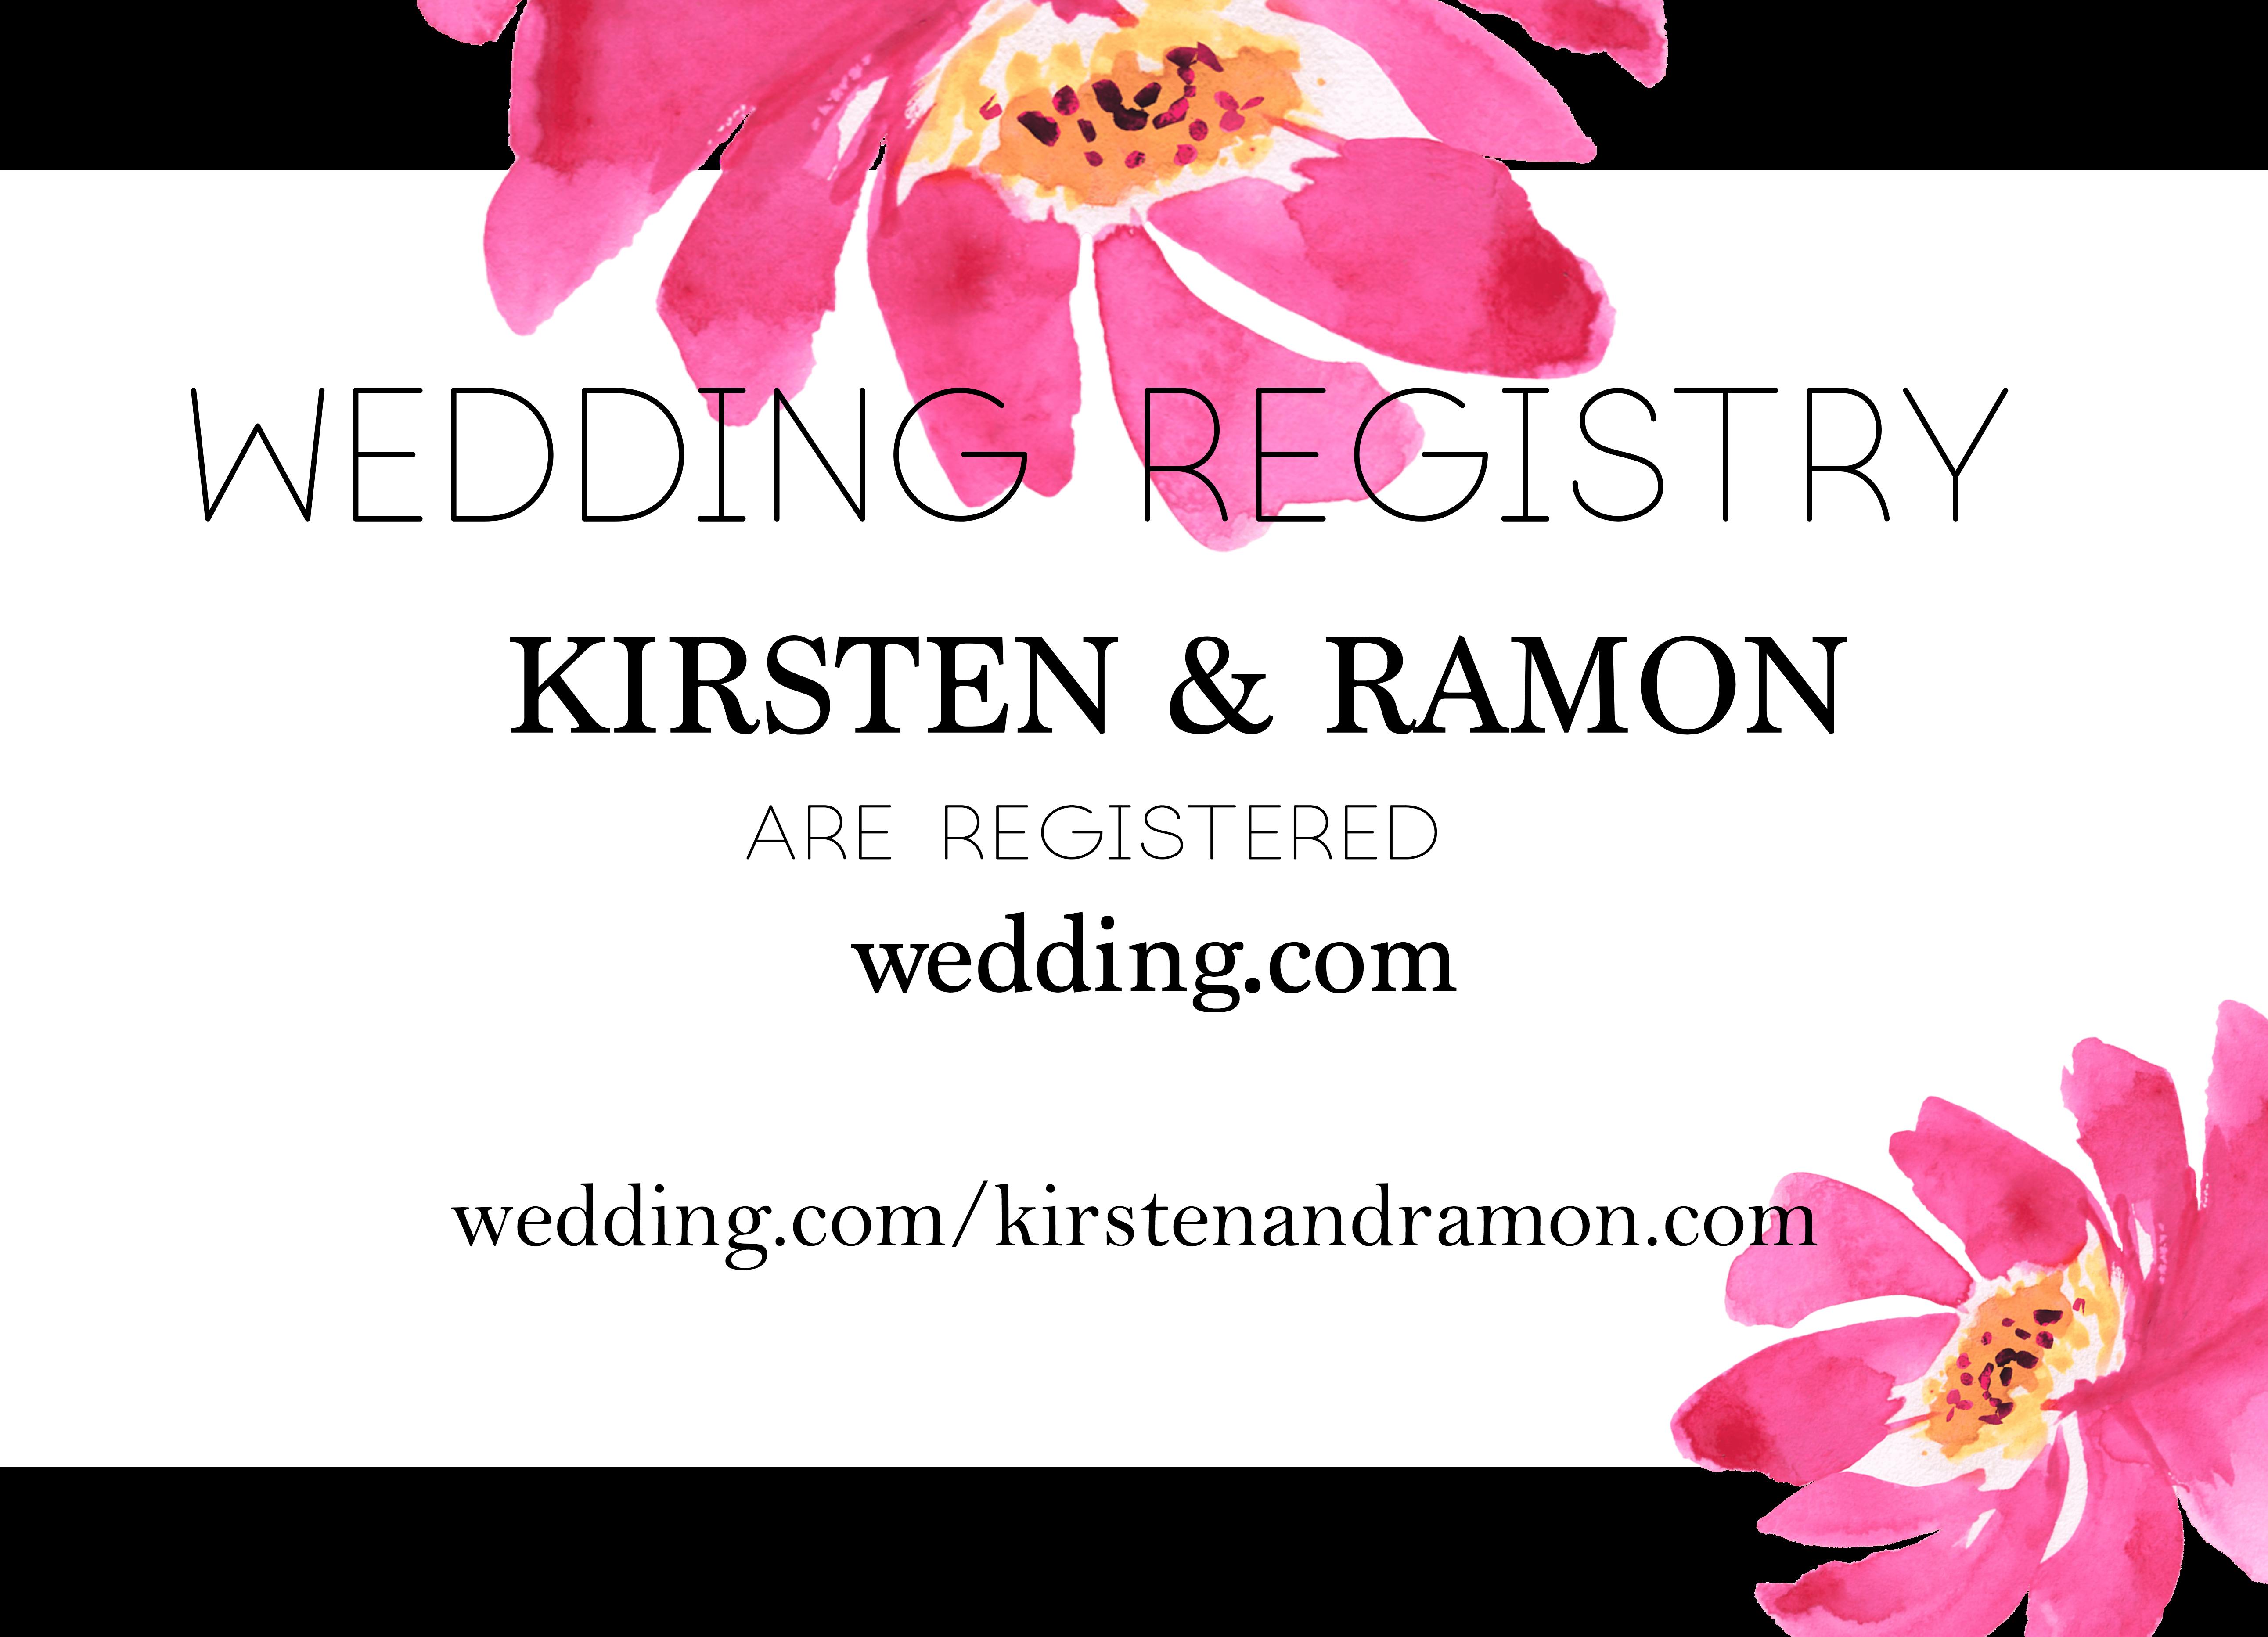 image regarding Free Printable Registry Cards referred to as Free of charge Ground breaking Printable Watercolor Marriage Registry Card